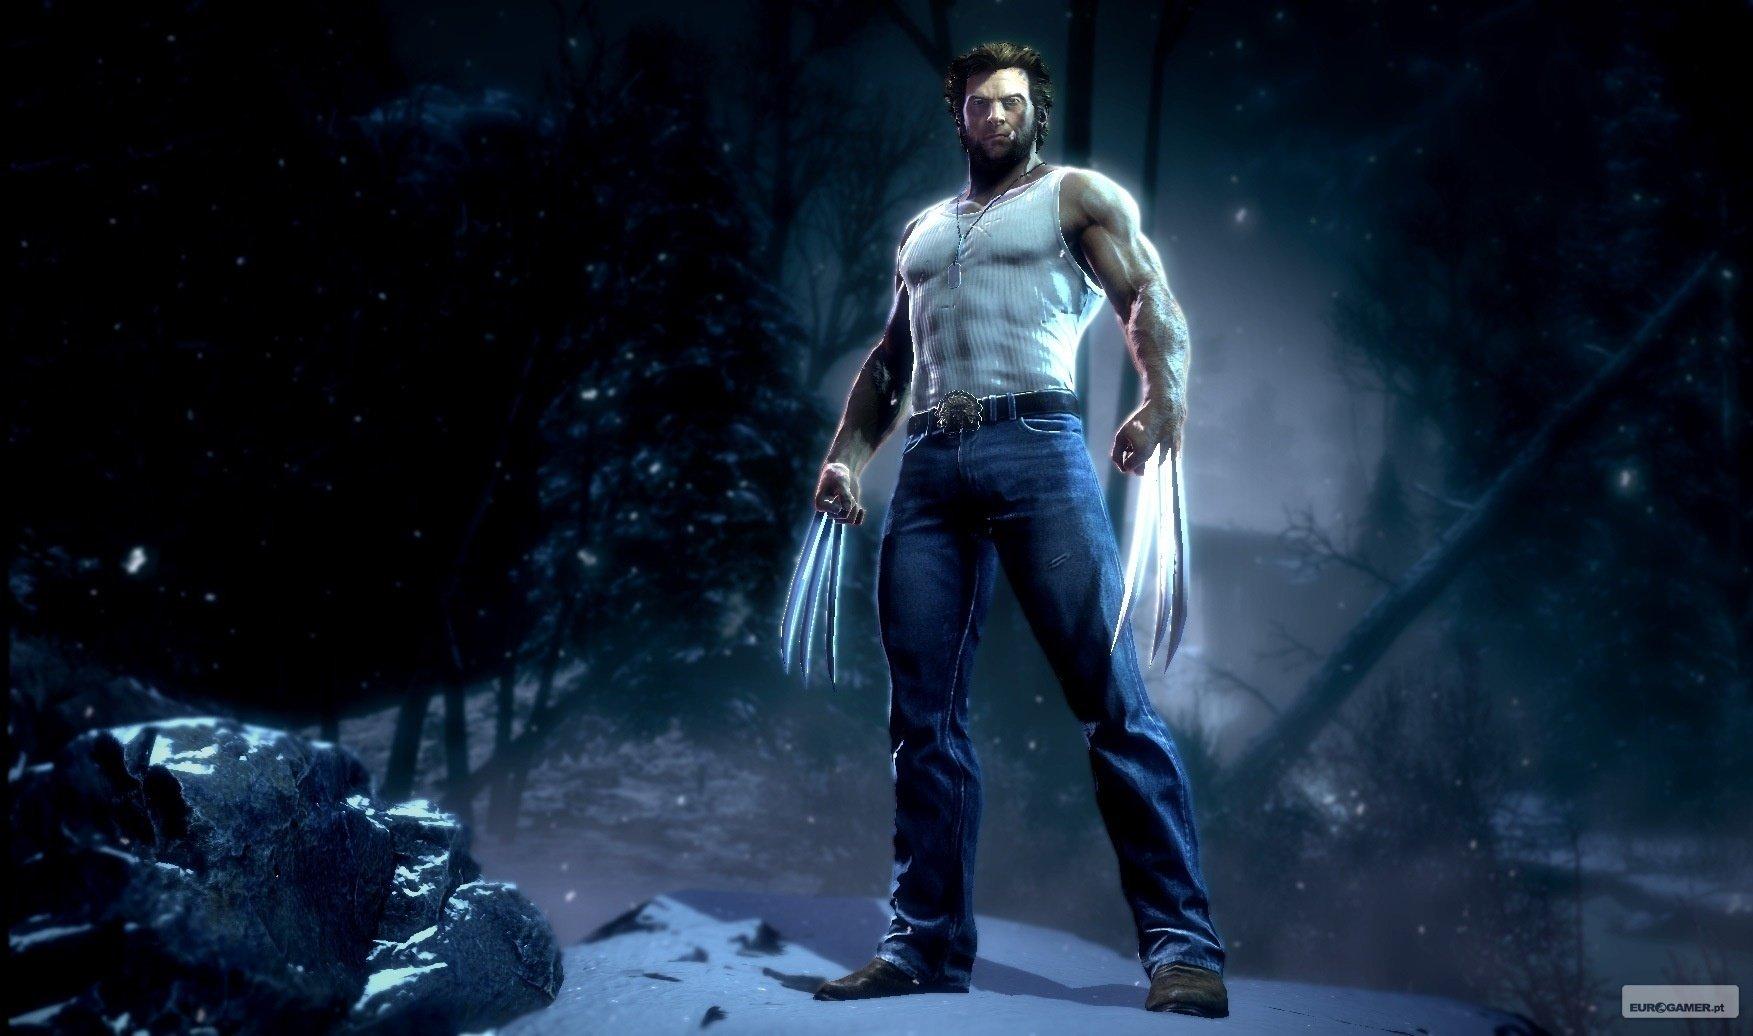 Men Origins Wolverine video game wallpapers Wallpaper 128 of 1753x1036